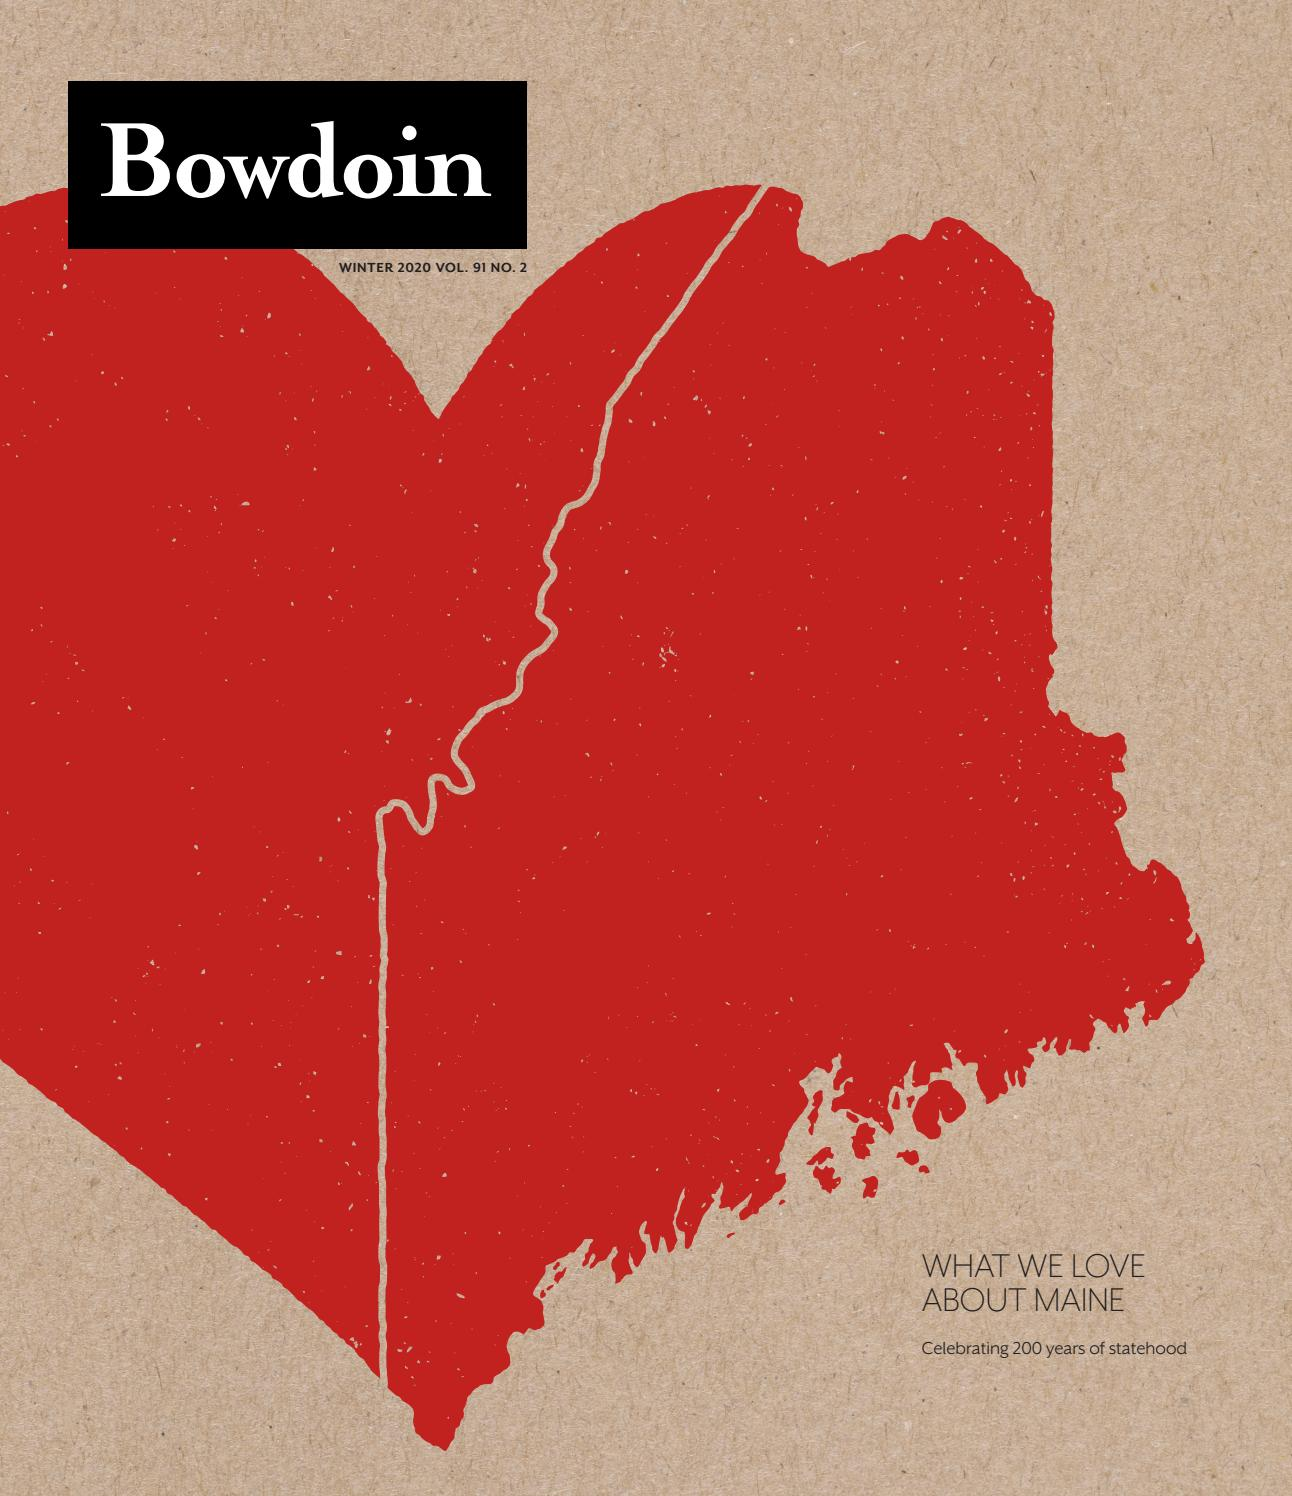 Bowdoin Magazine Vol 91 No 2 Winter 2020 By Bowdoin Magazine Issuu